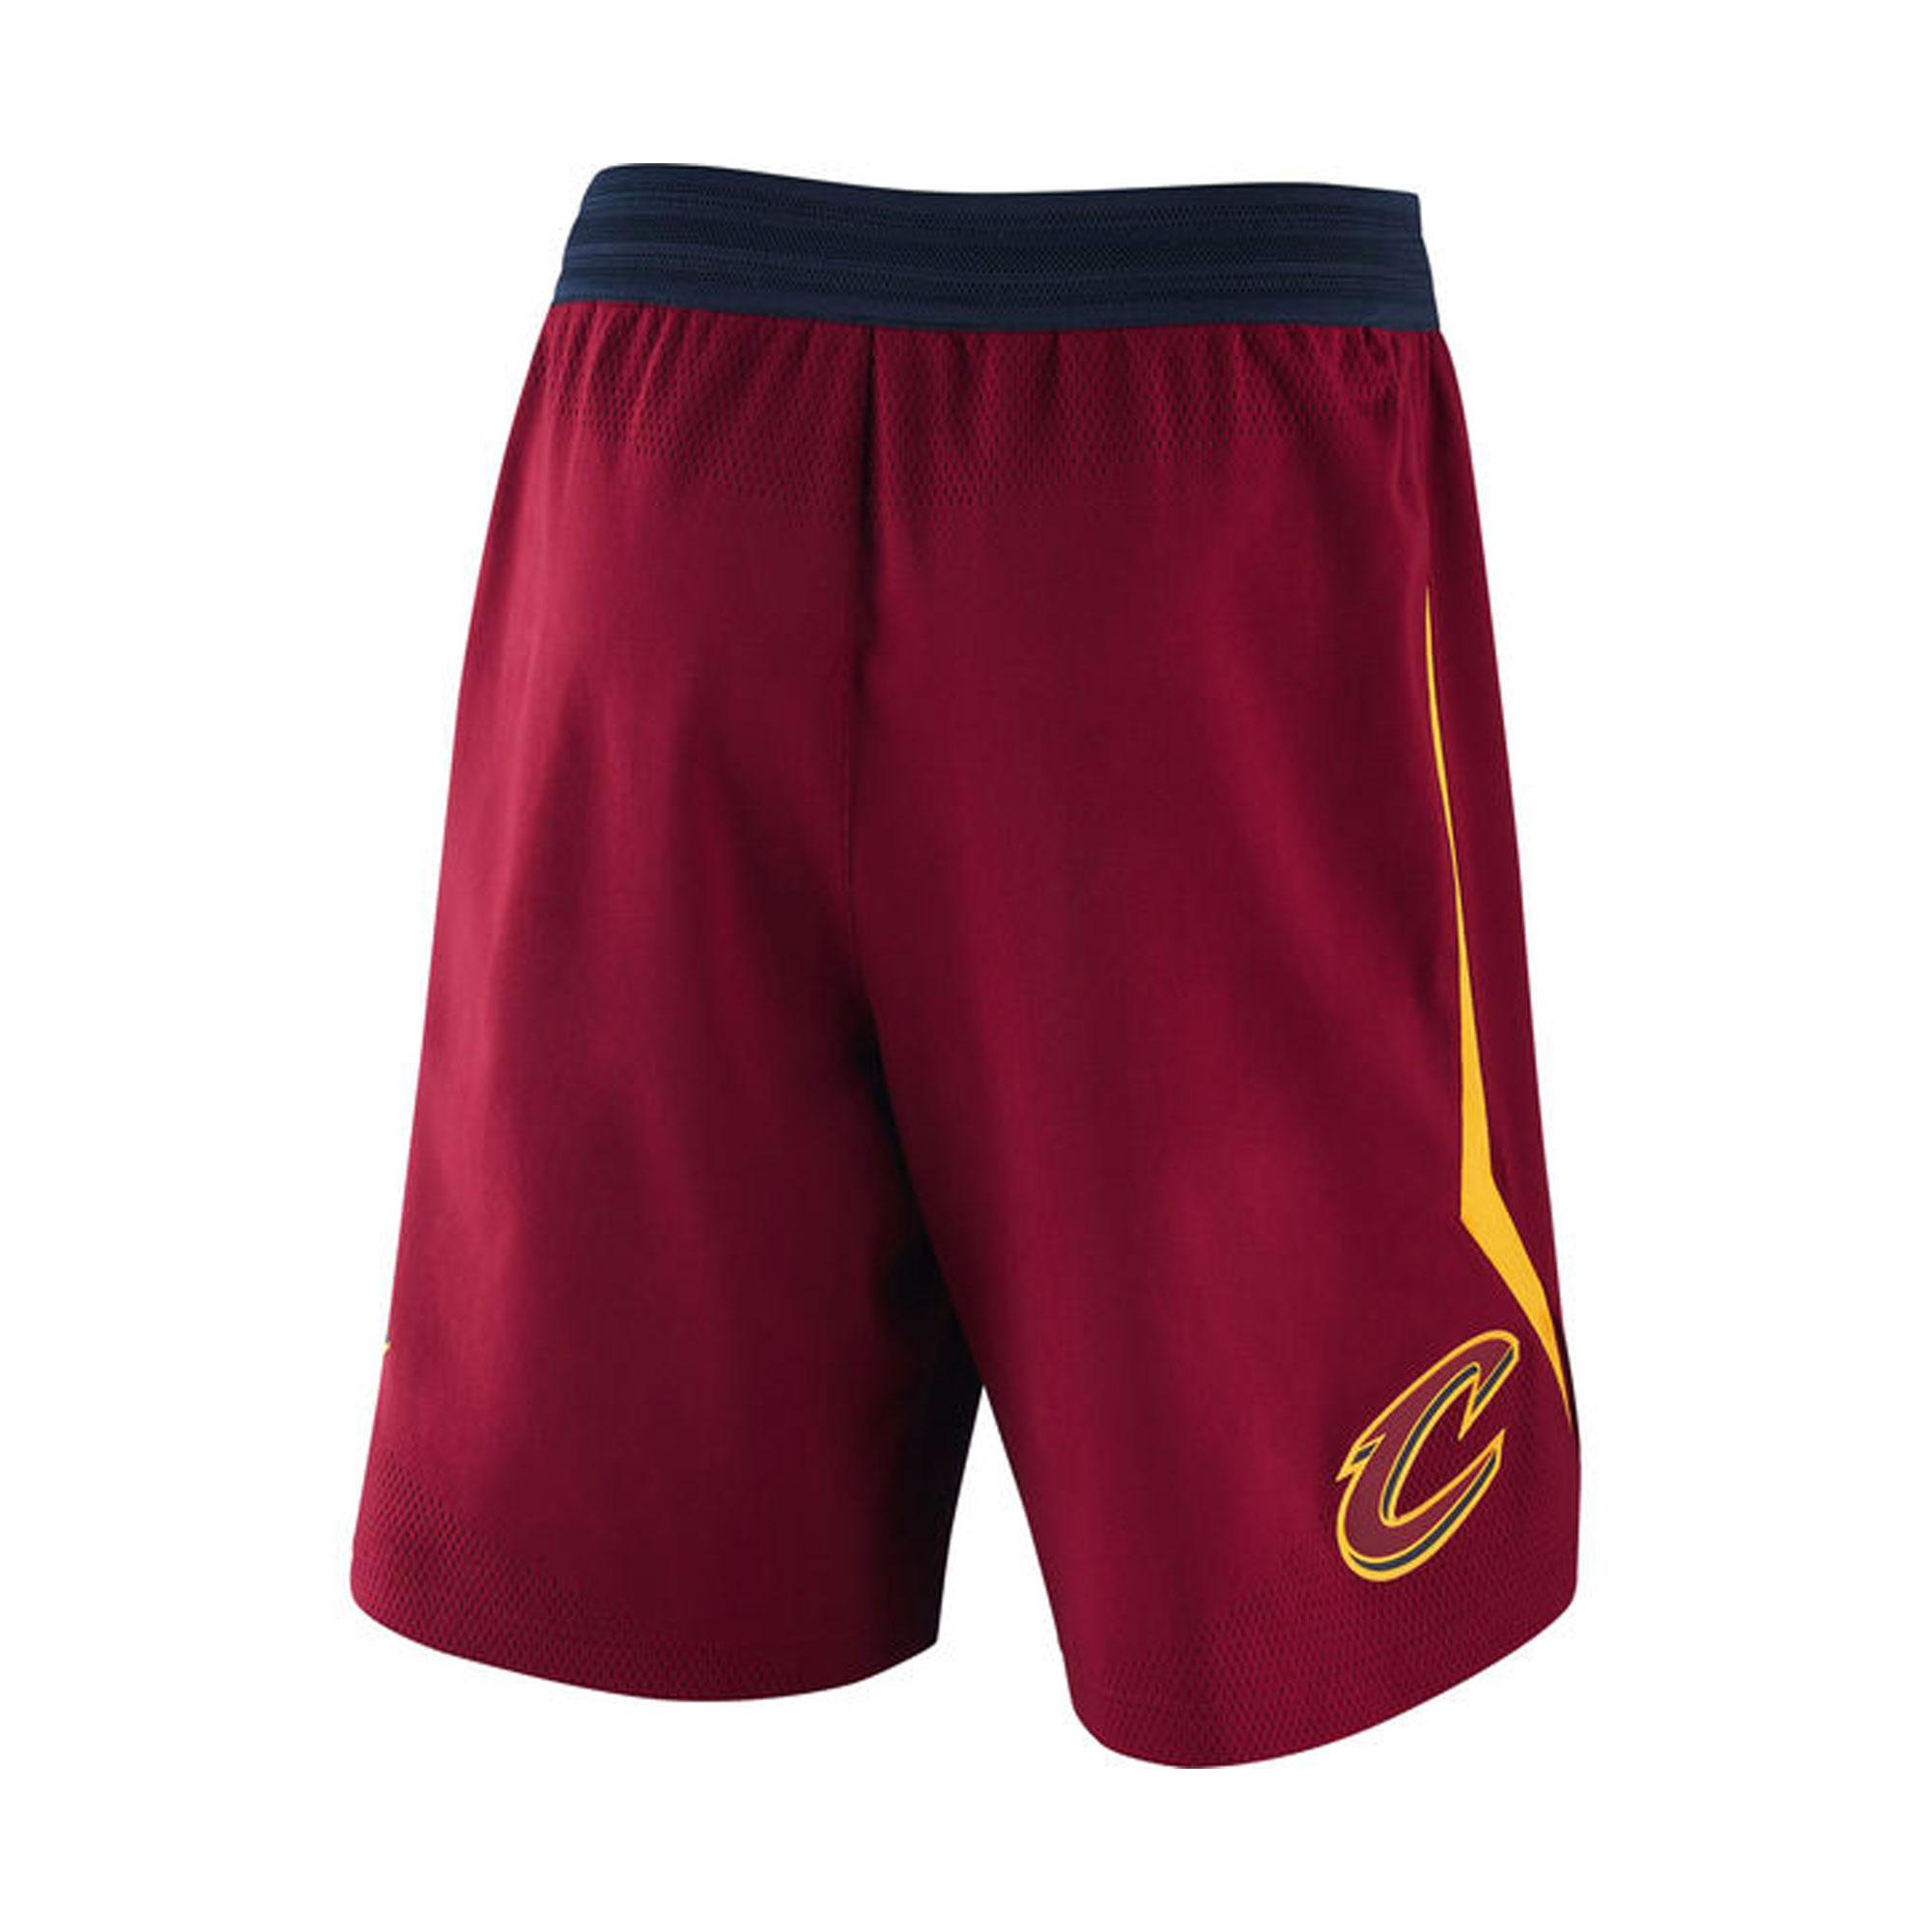 Cleveland Cavaliers Short (SRT-RED-CAVS01)